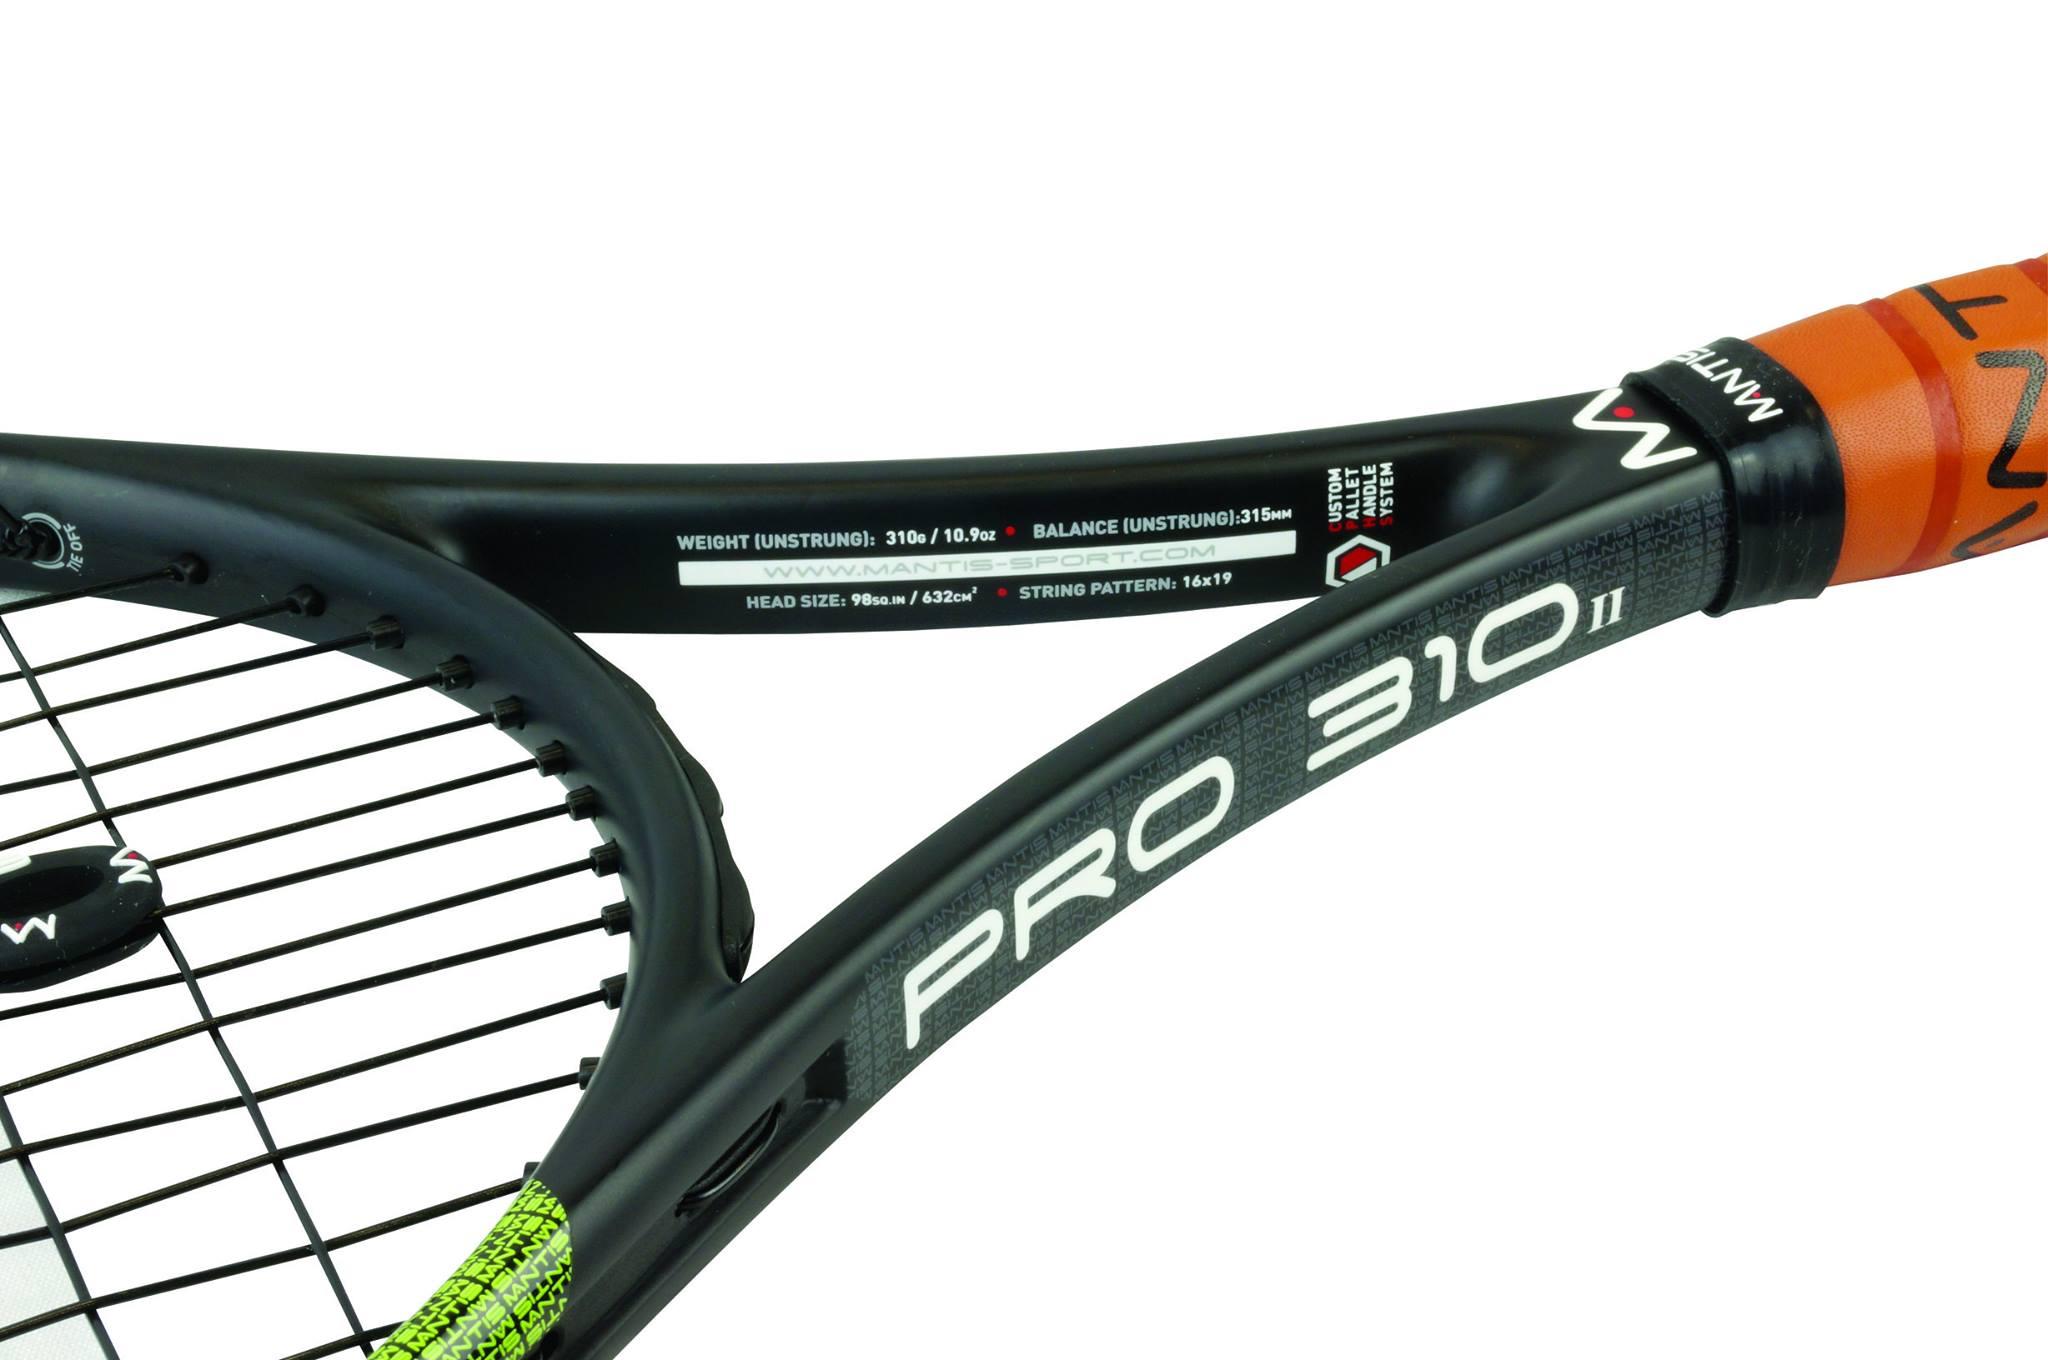 131ad9c412 Mantis Pro 310 II - TennisTaste.com